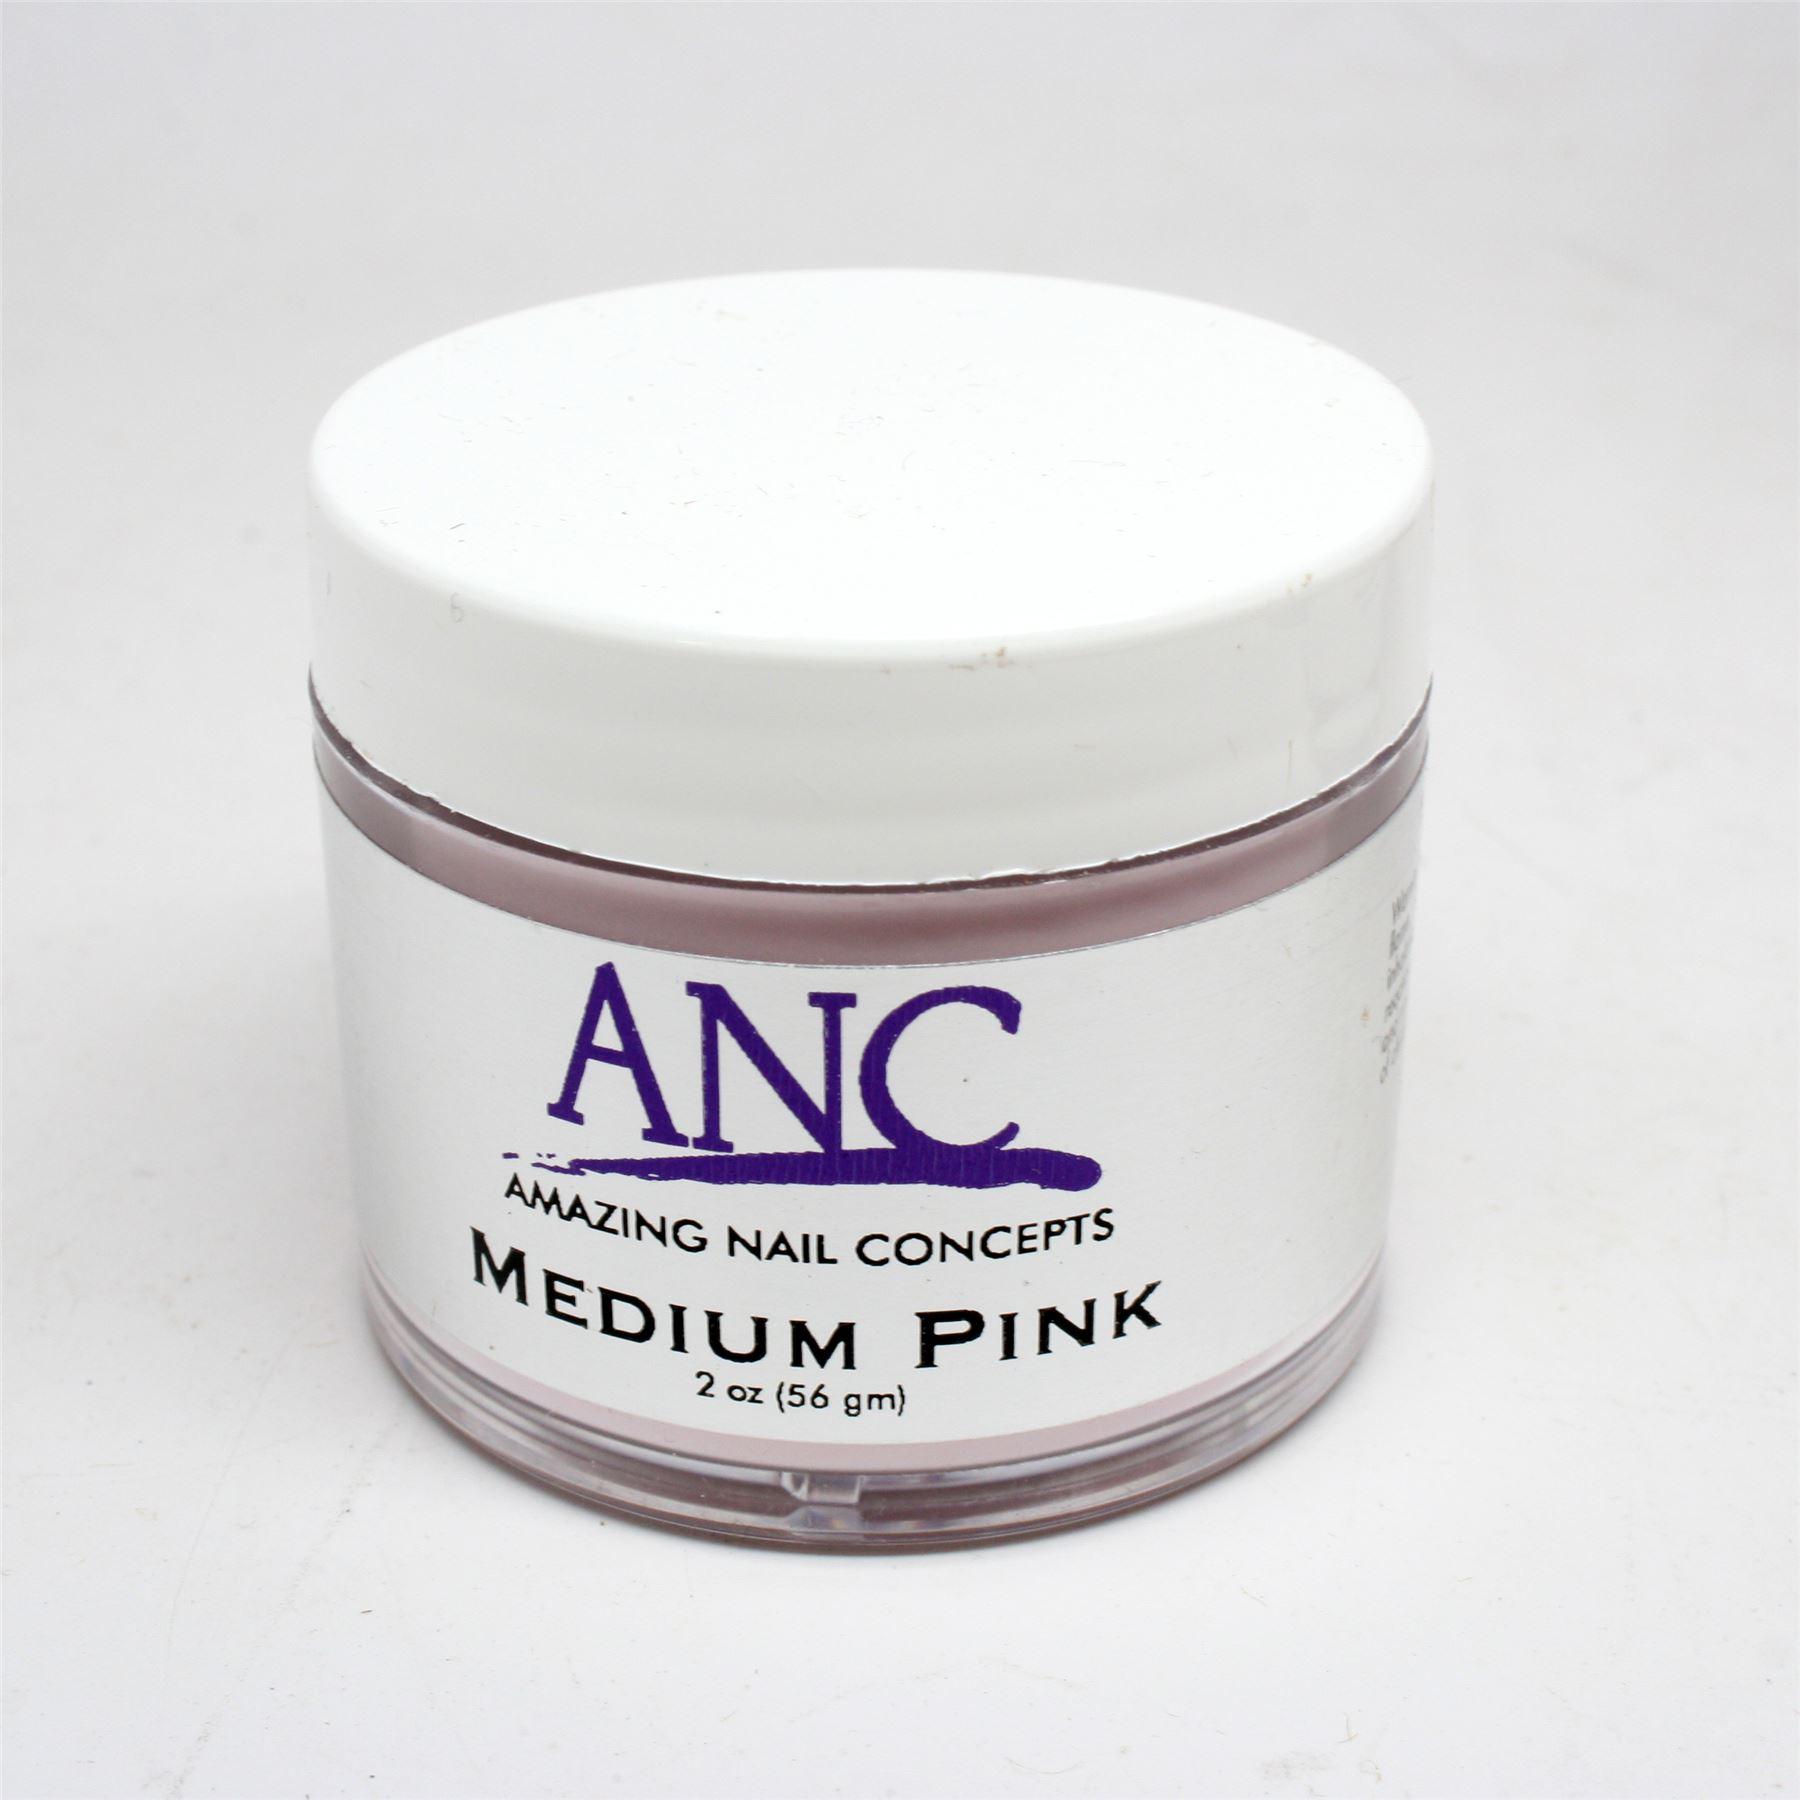 ANC Dip Powder Amazing Nail Concepts Medium Pink MP02 2 Oz